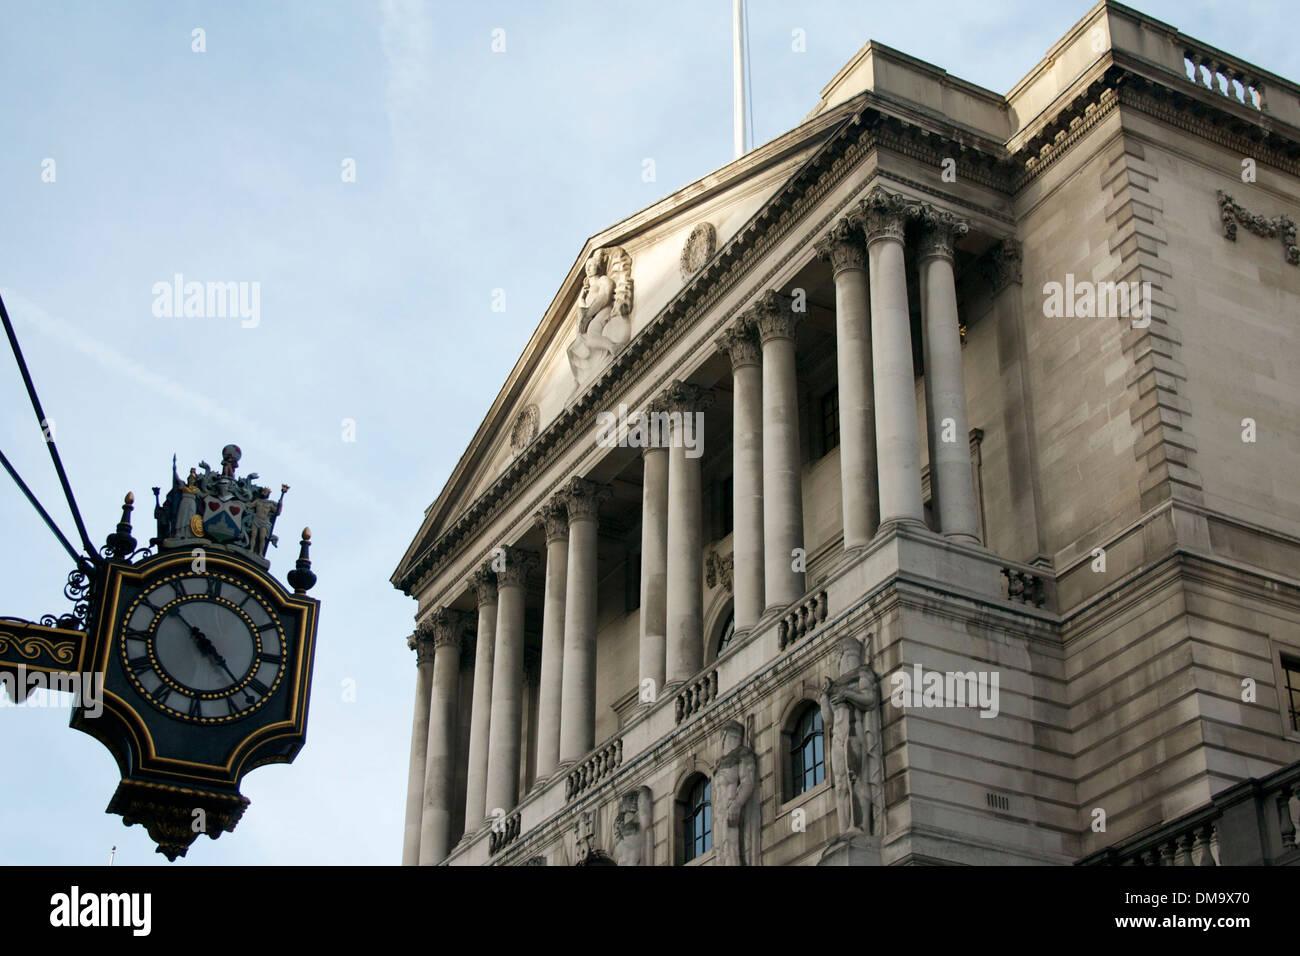 Bank of England with clock, London, UK - Stock Image